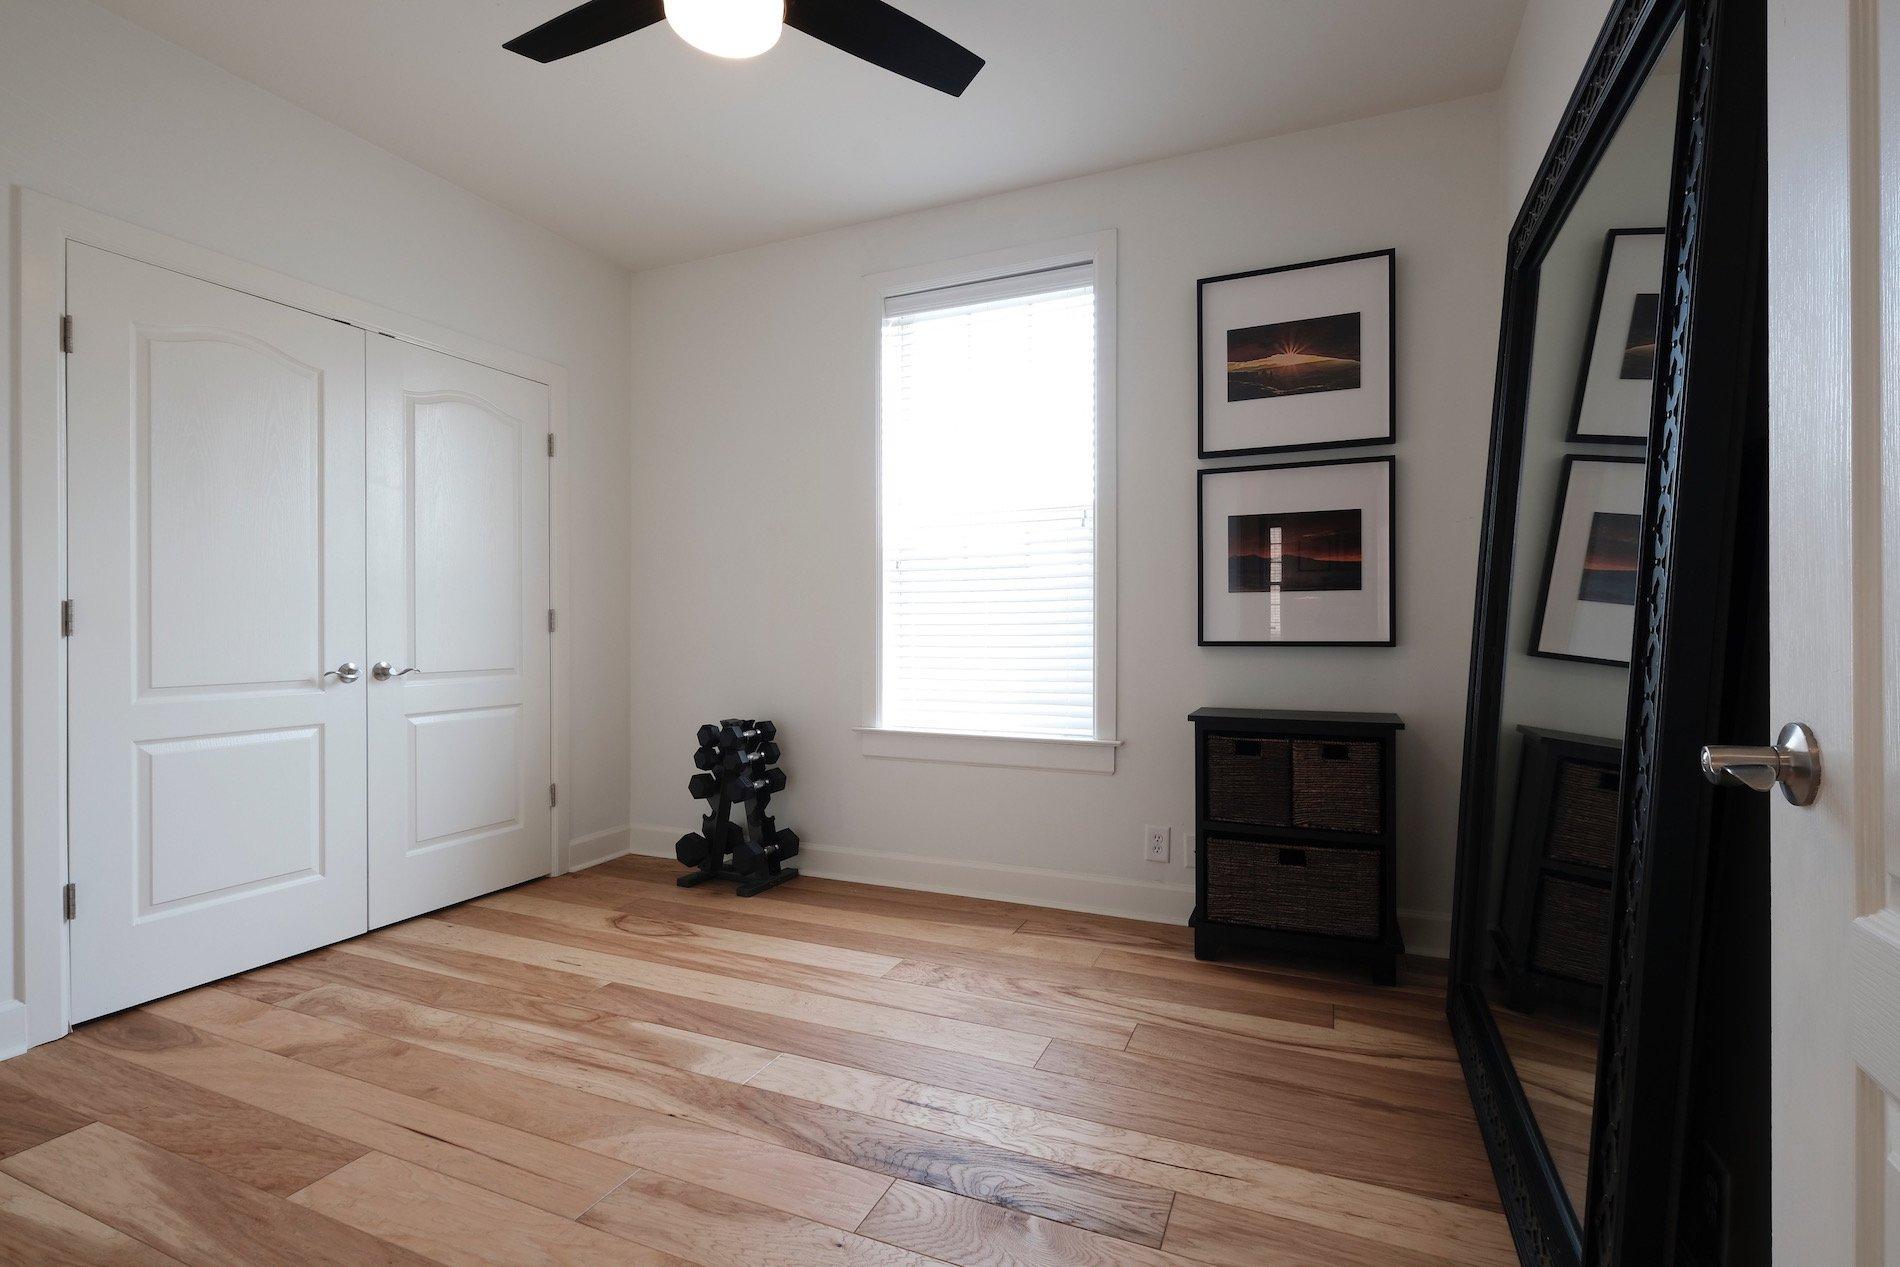 Sherwin Williams Premium White Paint, large mirror, yoga room